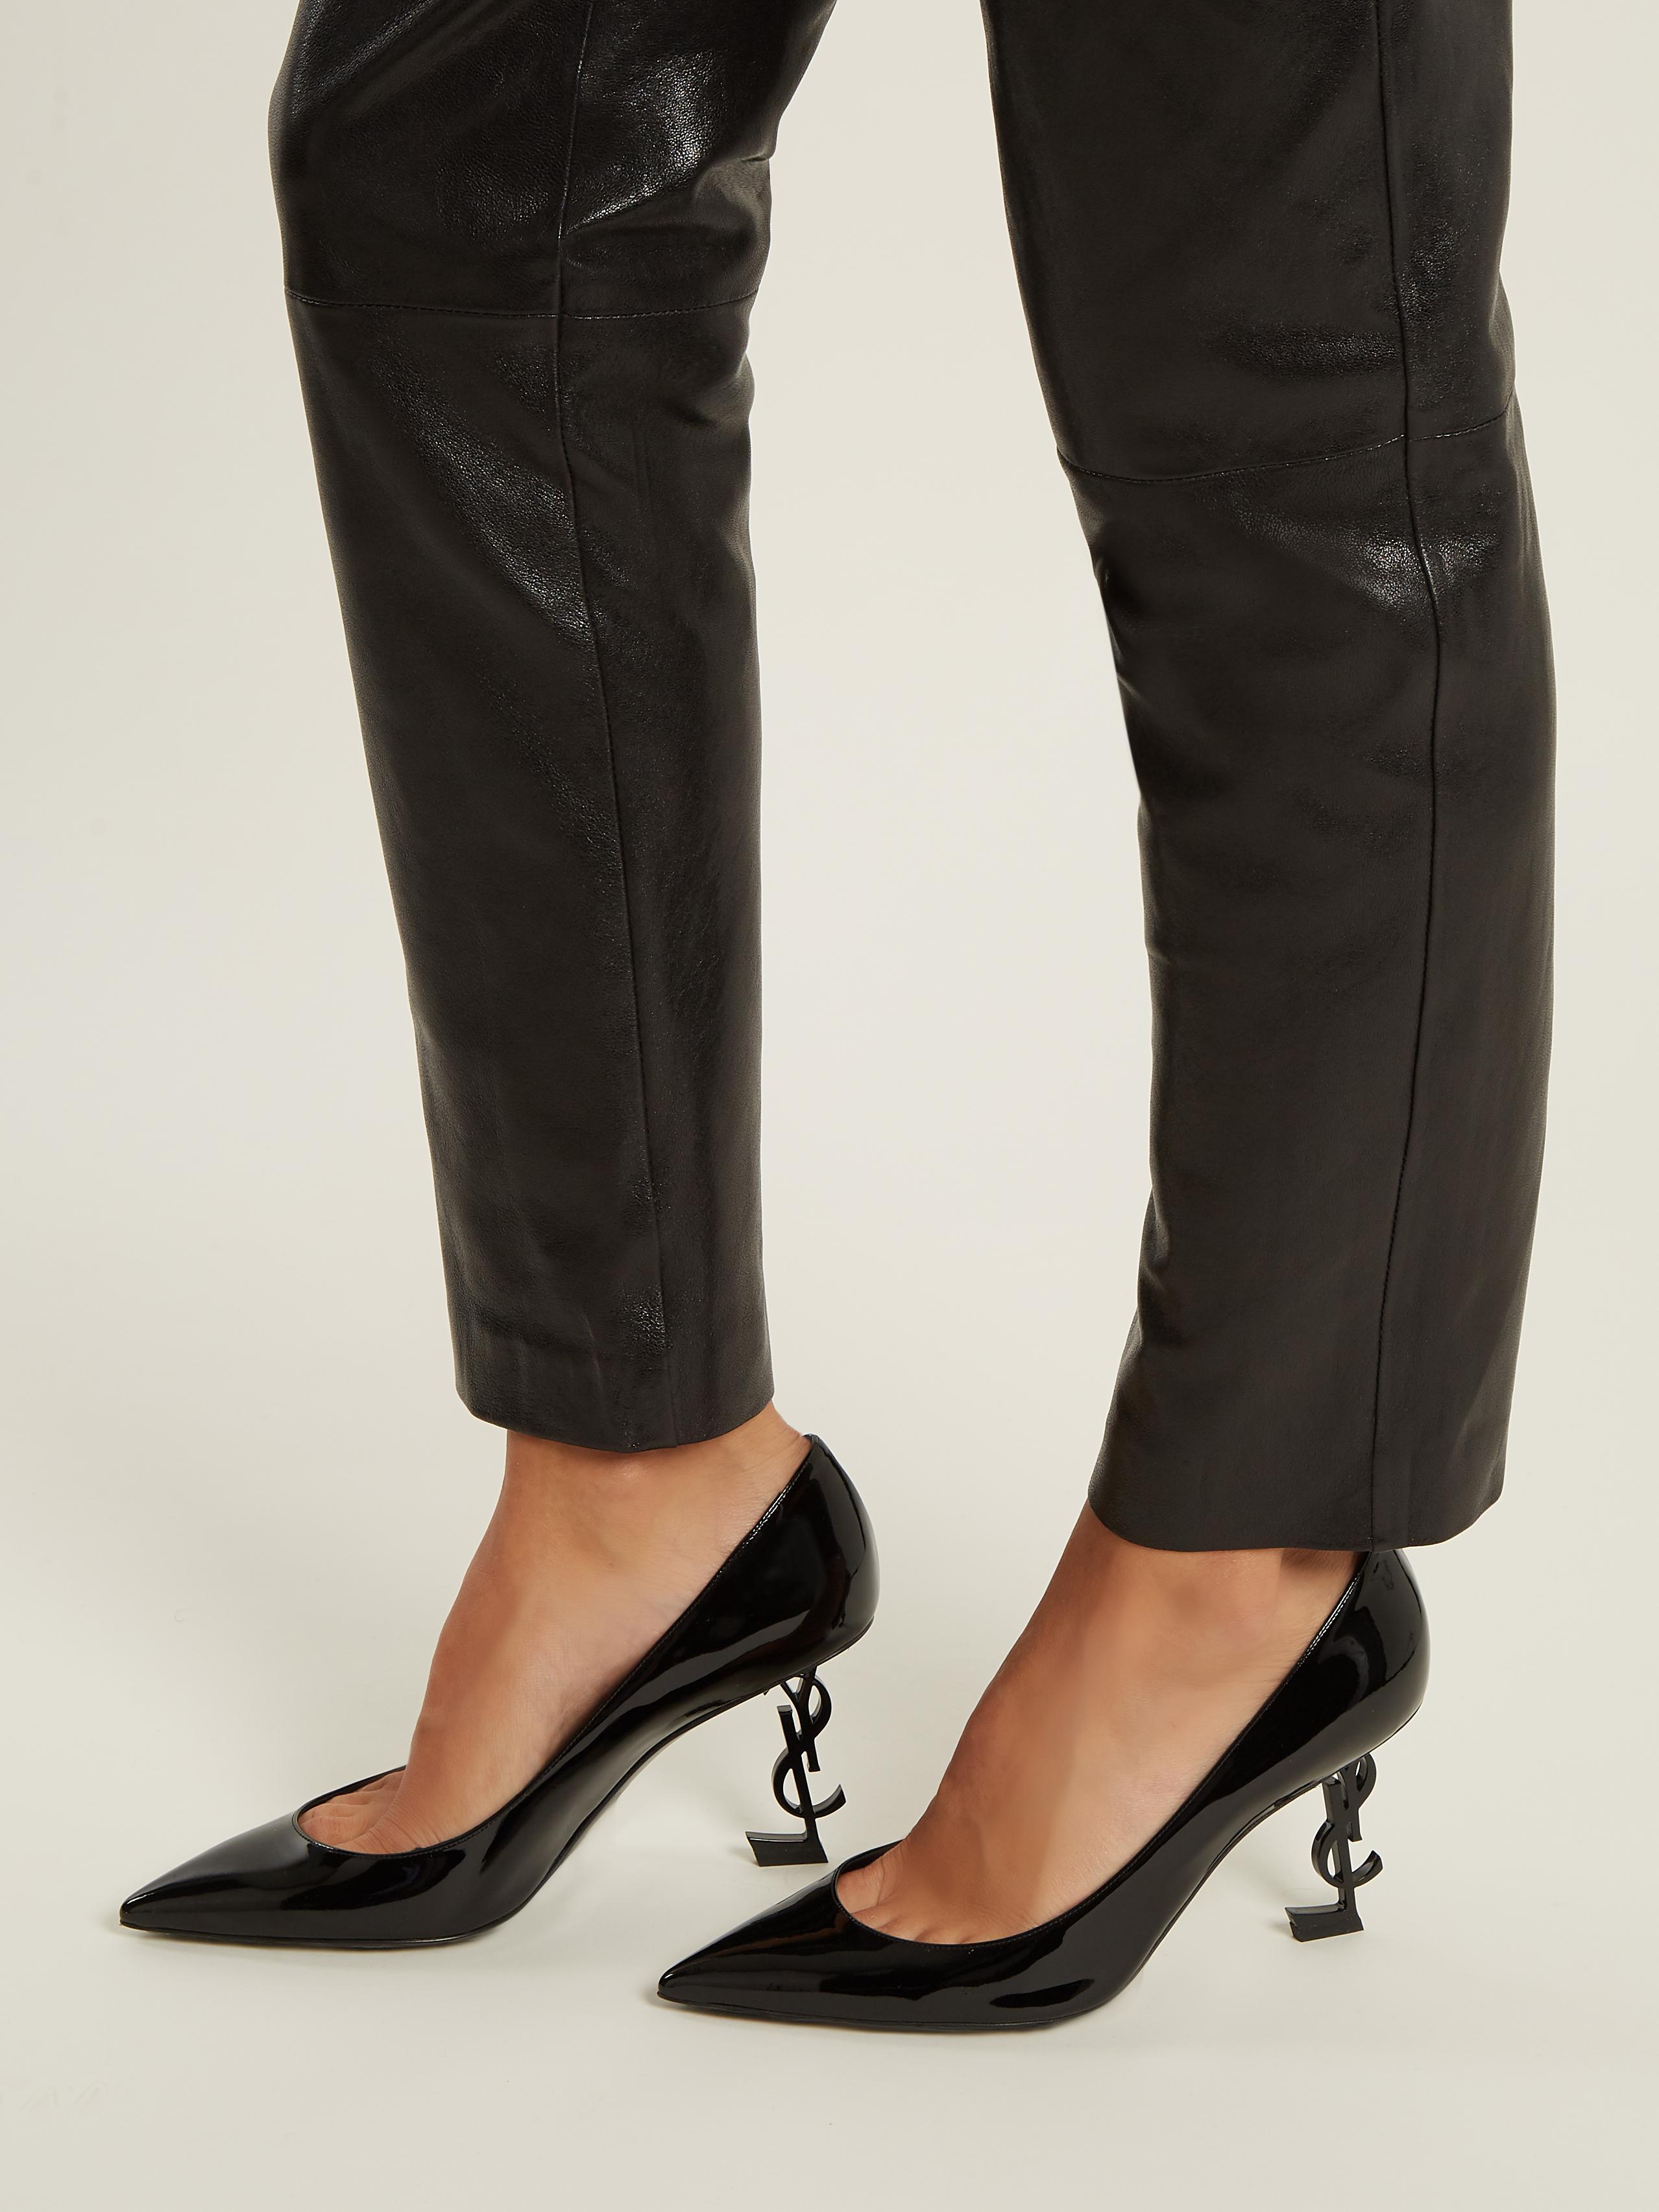 89e536ade Saint Laurent Opyum Logo-heel Patent-leather Pumps in Black - Lyst